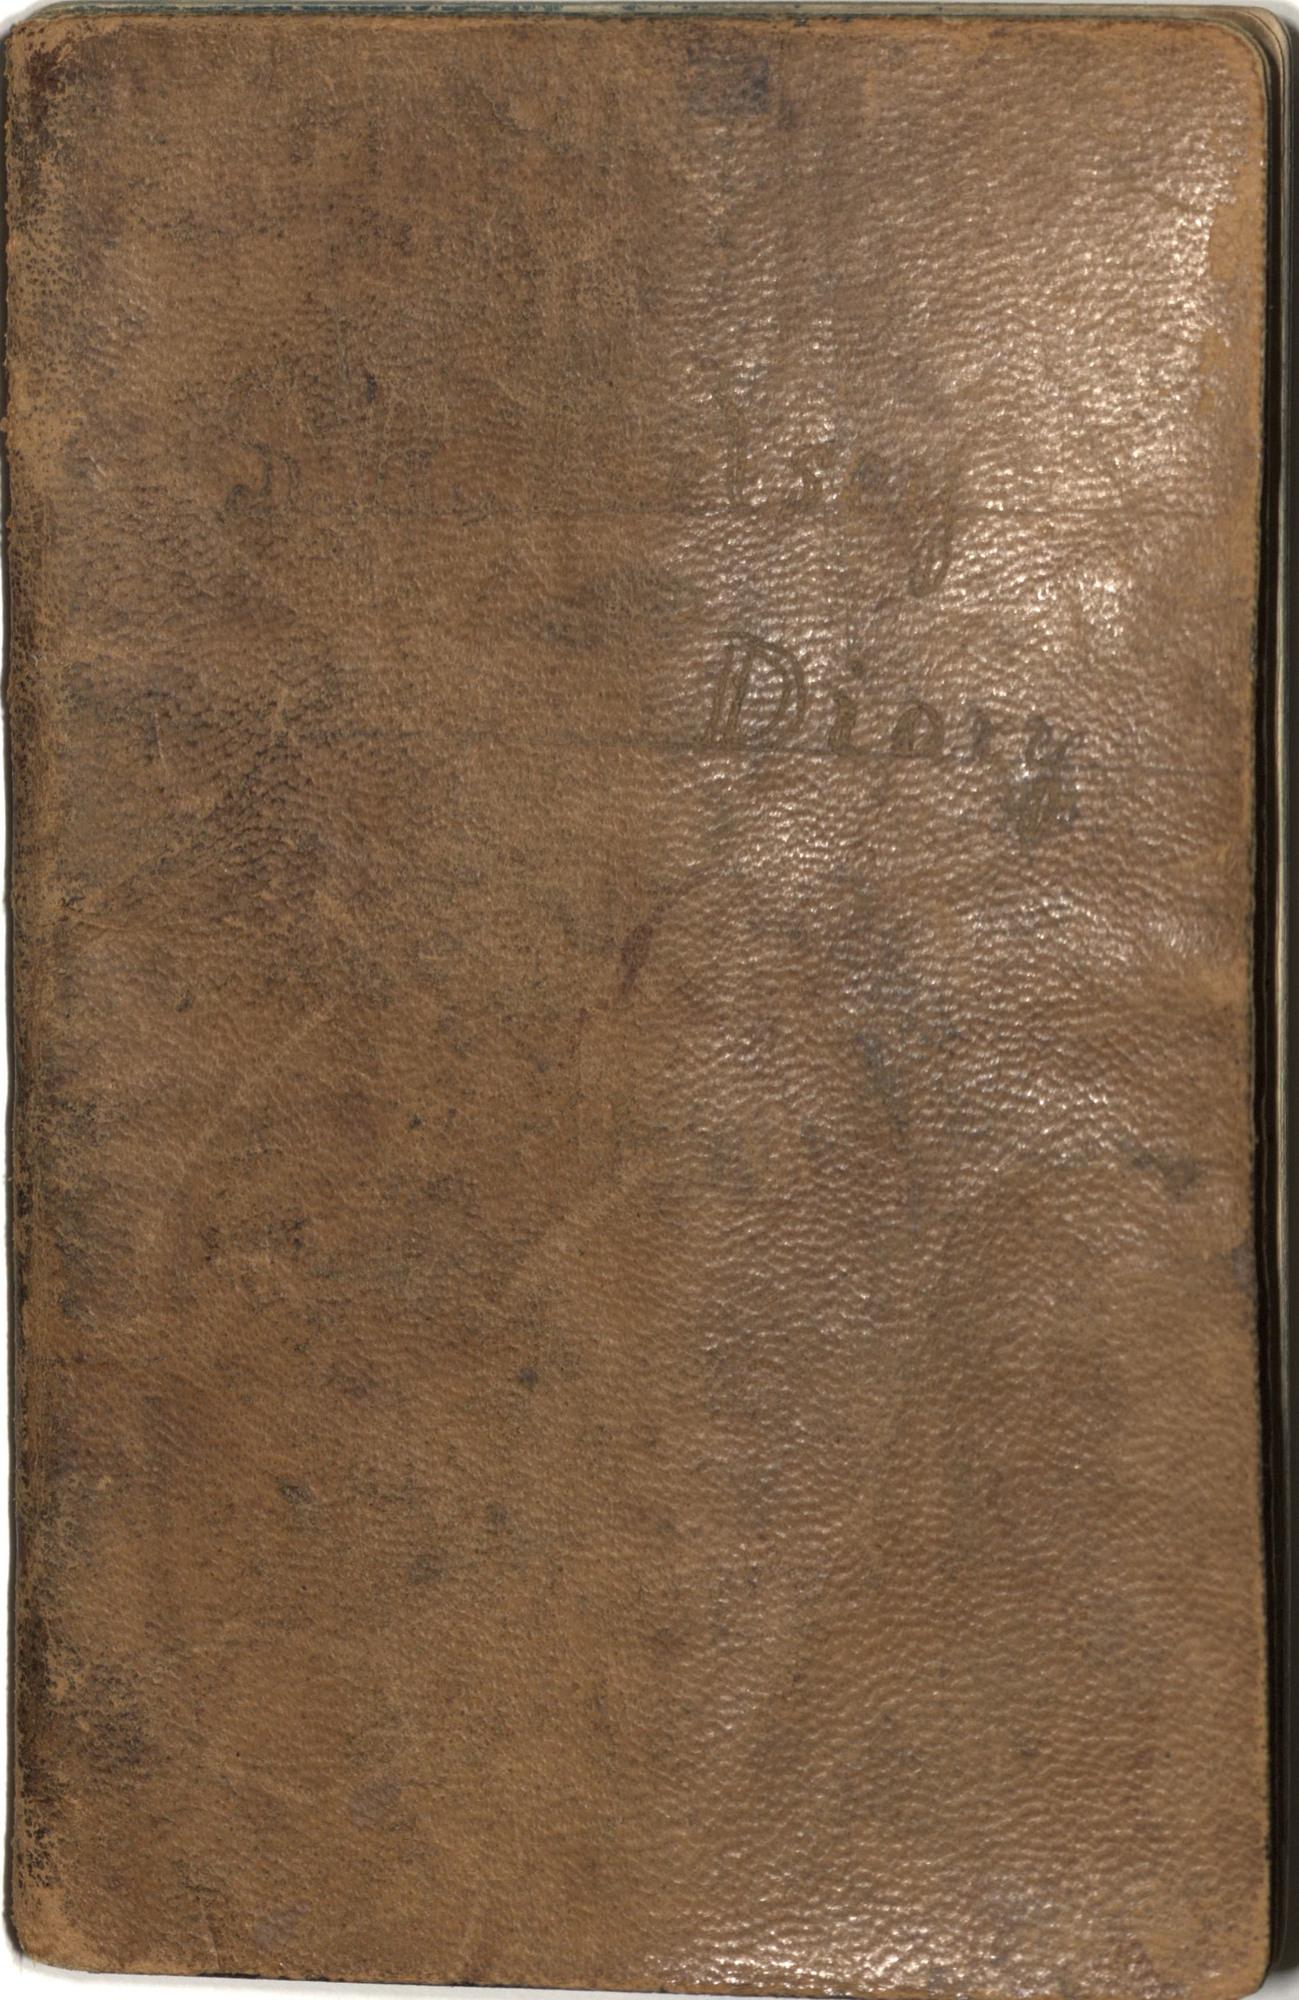 Ms1990-029_KelseyStephen_Diary_1865_frontcover.jpg